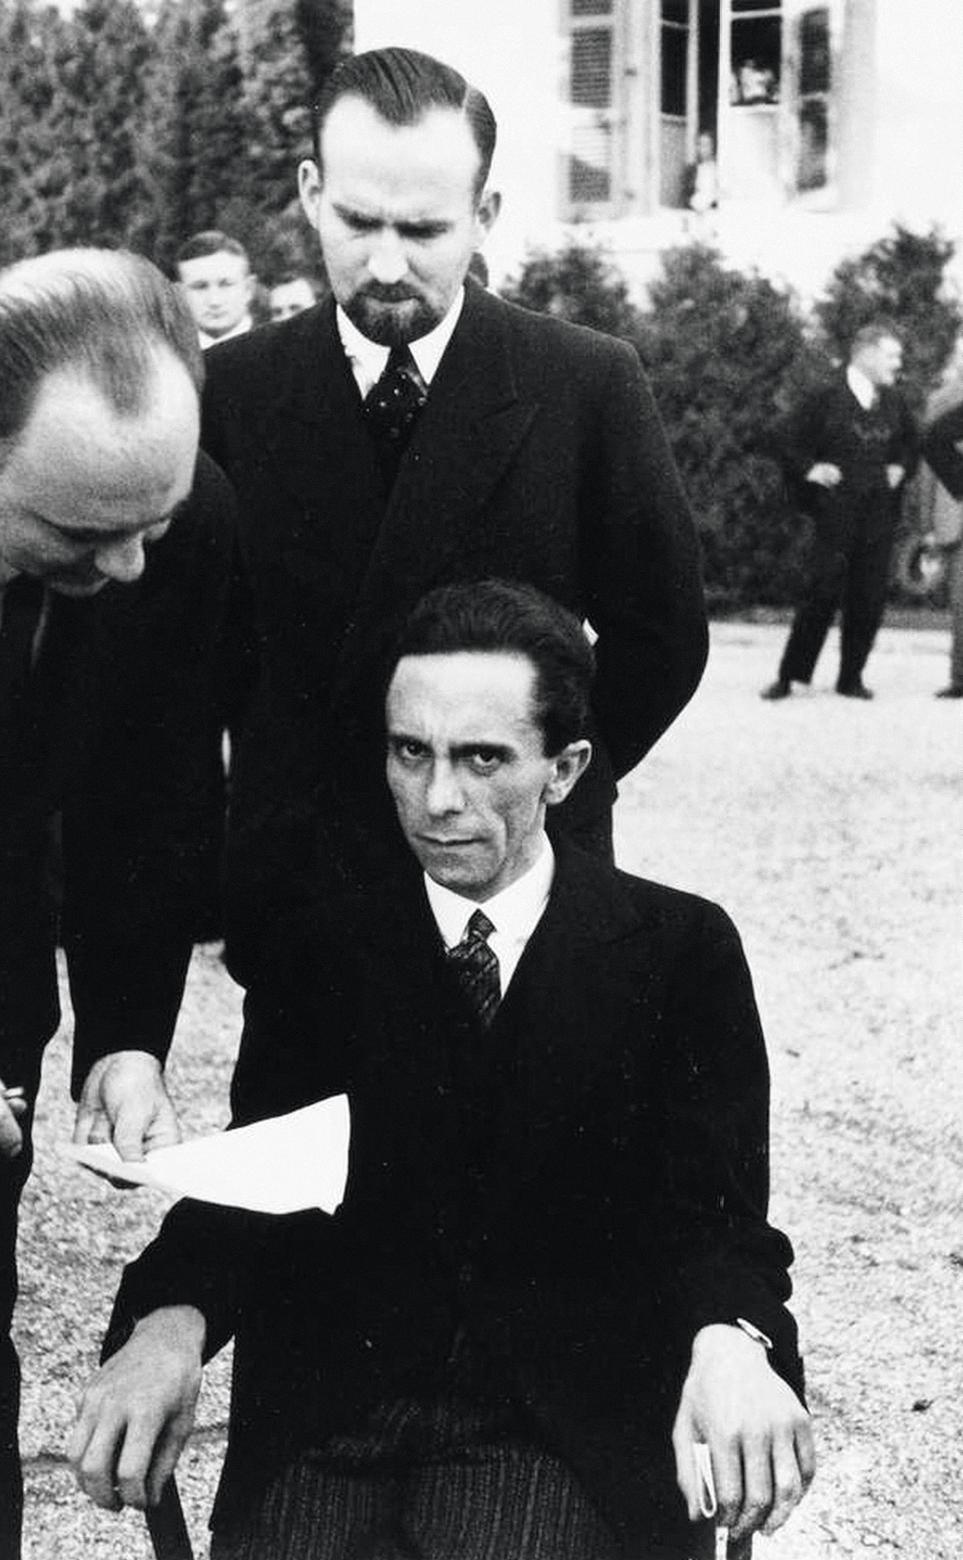 Joseph Goebbels, photographie d'Alfred Eisenstaedt prise en 1933